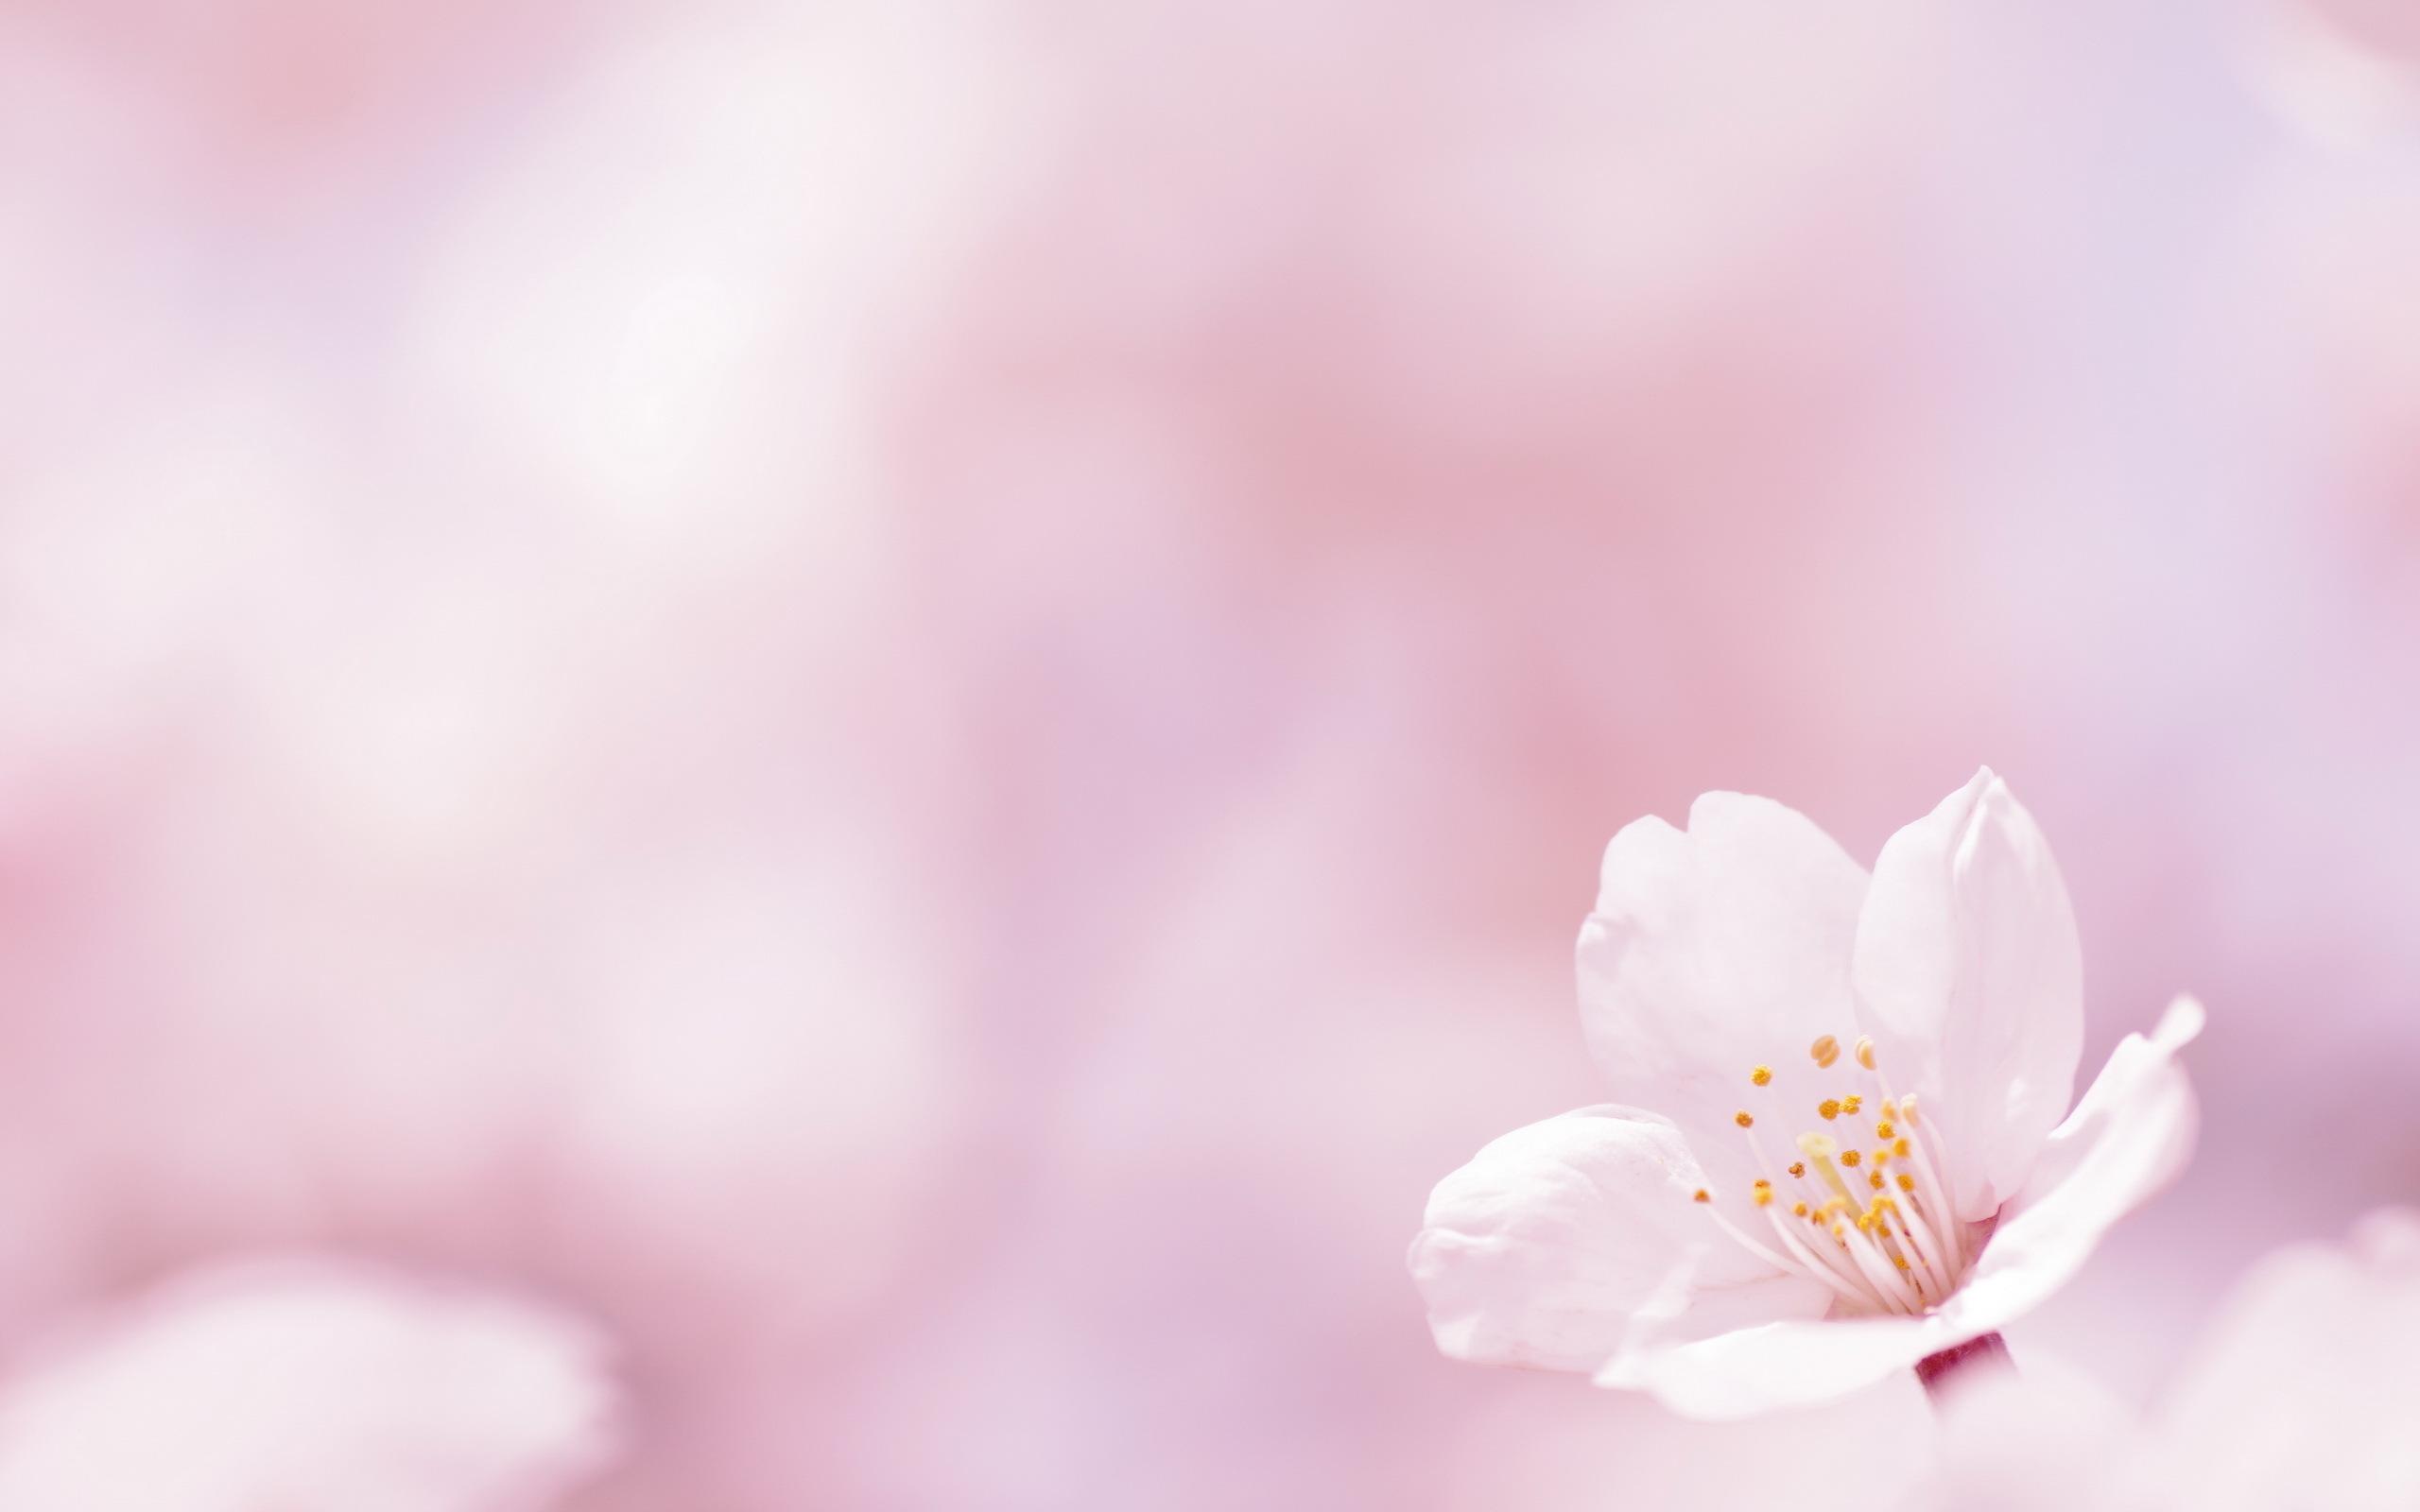 Free Pink Flower Wallpaper - WallpaperSafari